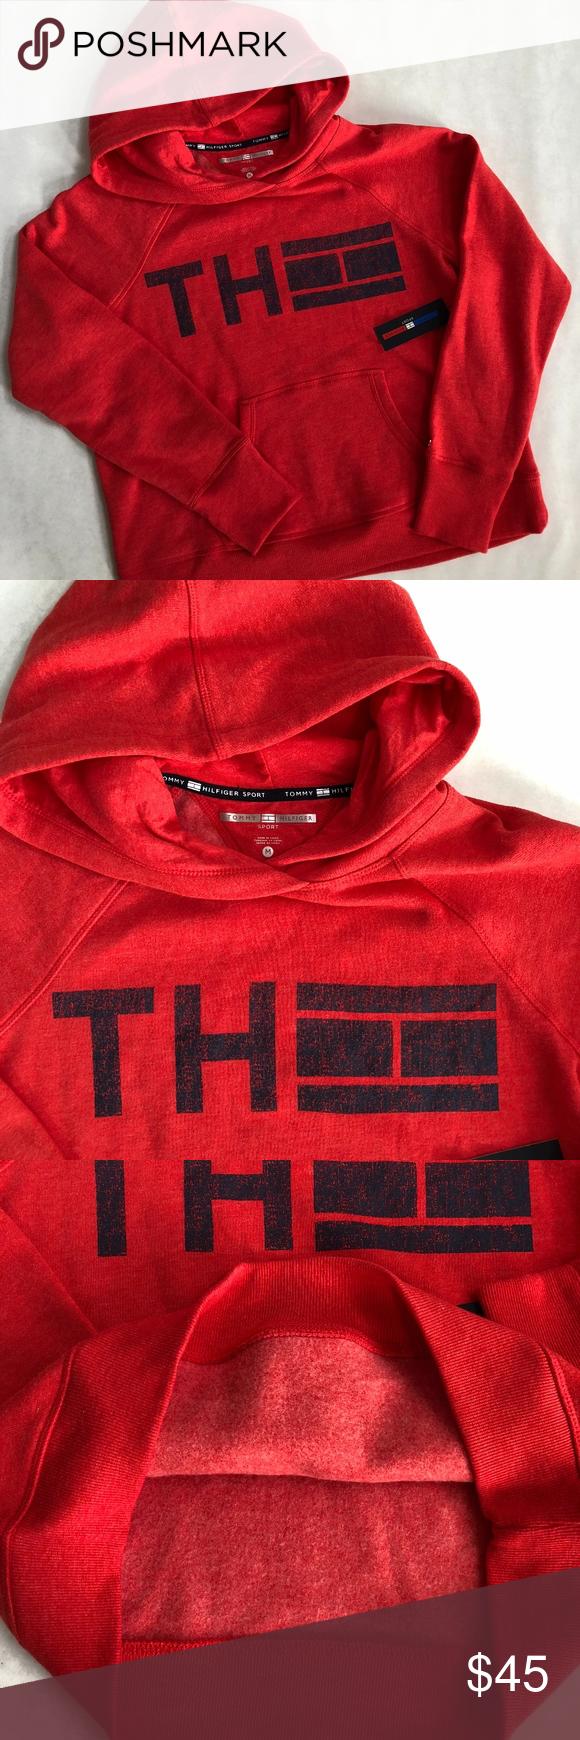 Tommy Hilfiger Th Logo Flag Red Blue Sweatshirt Sweatshirts Blue Sweatshirt Tommy Hilfiger